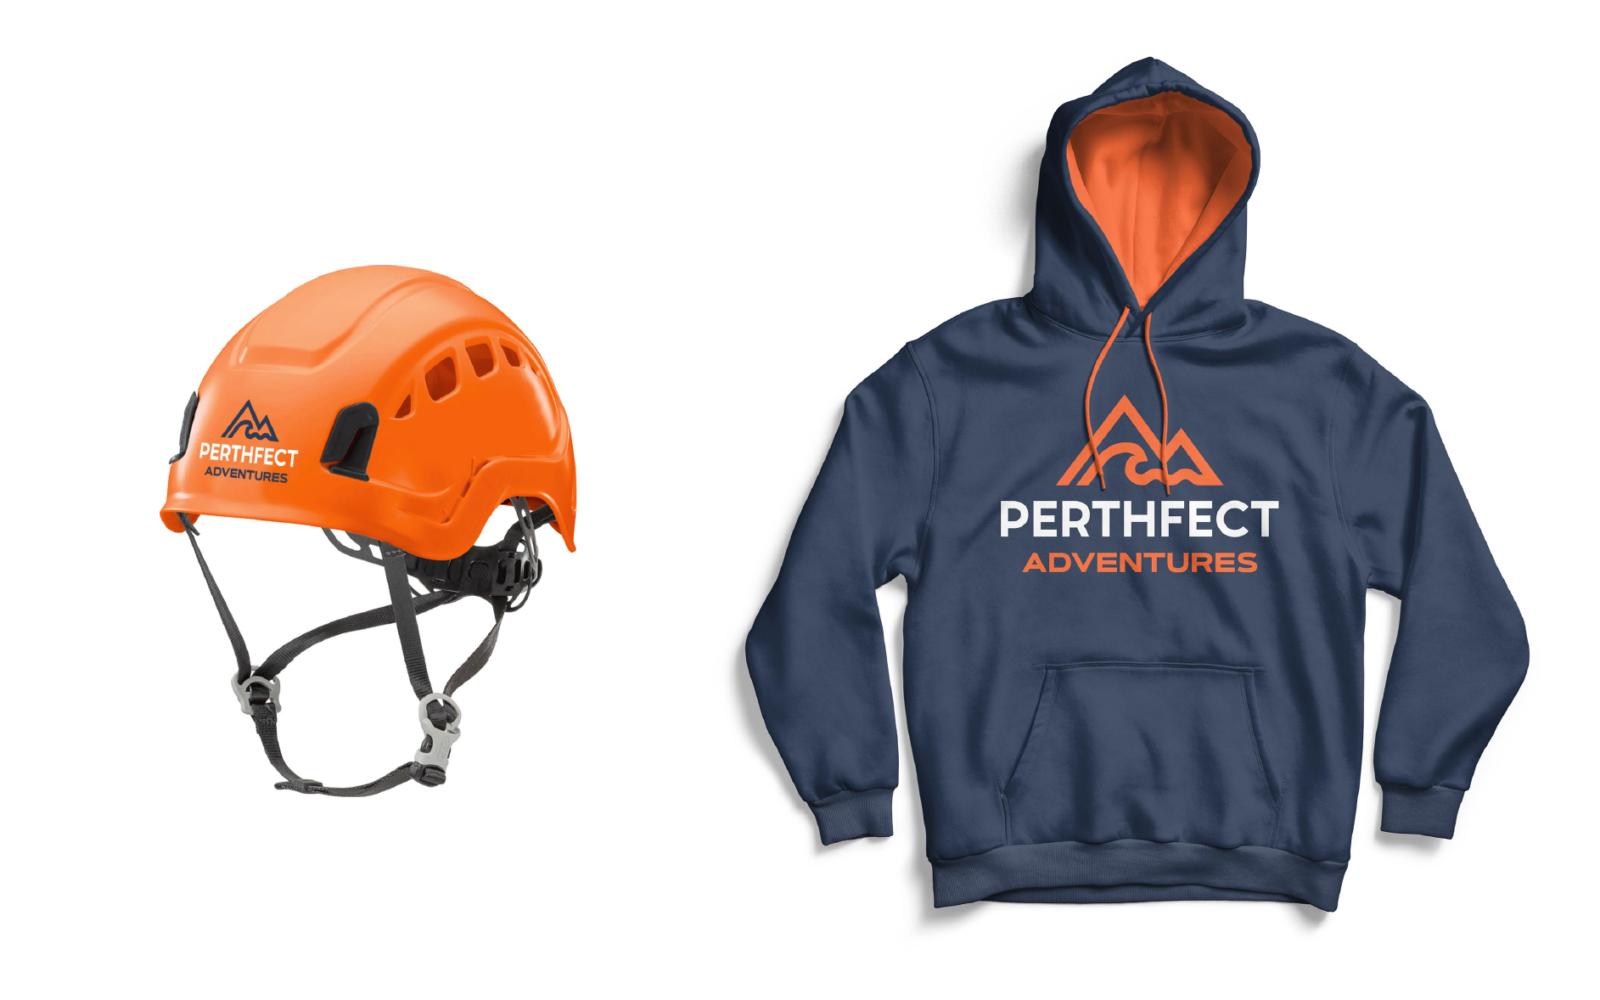 Perthfect Adventures Merchandise